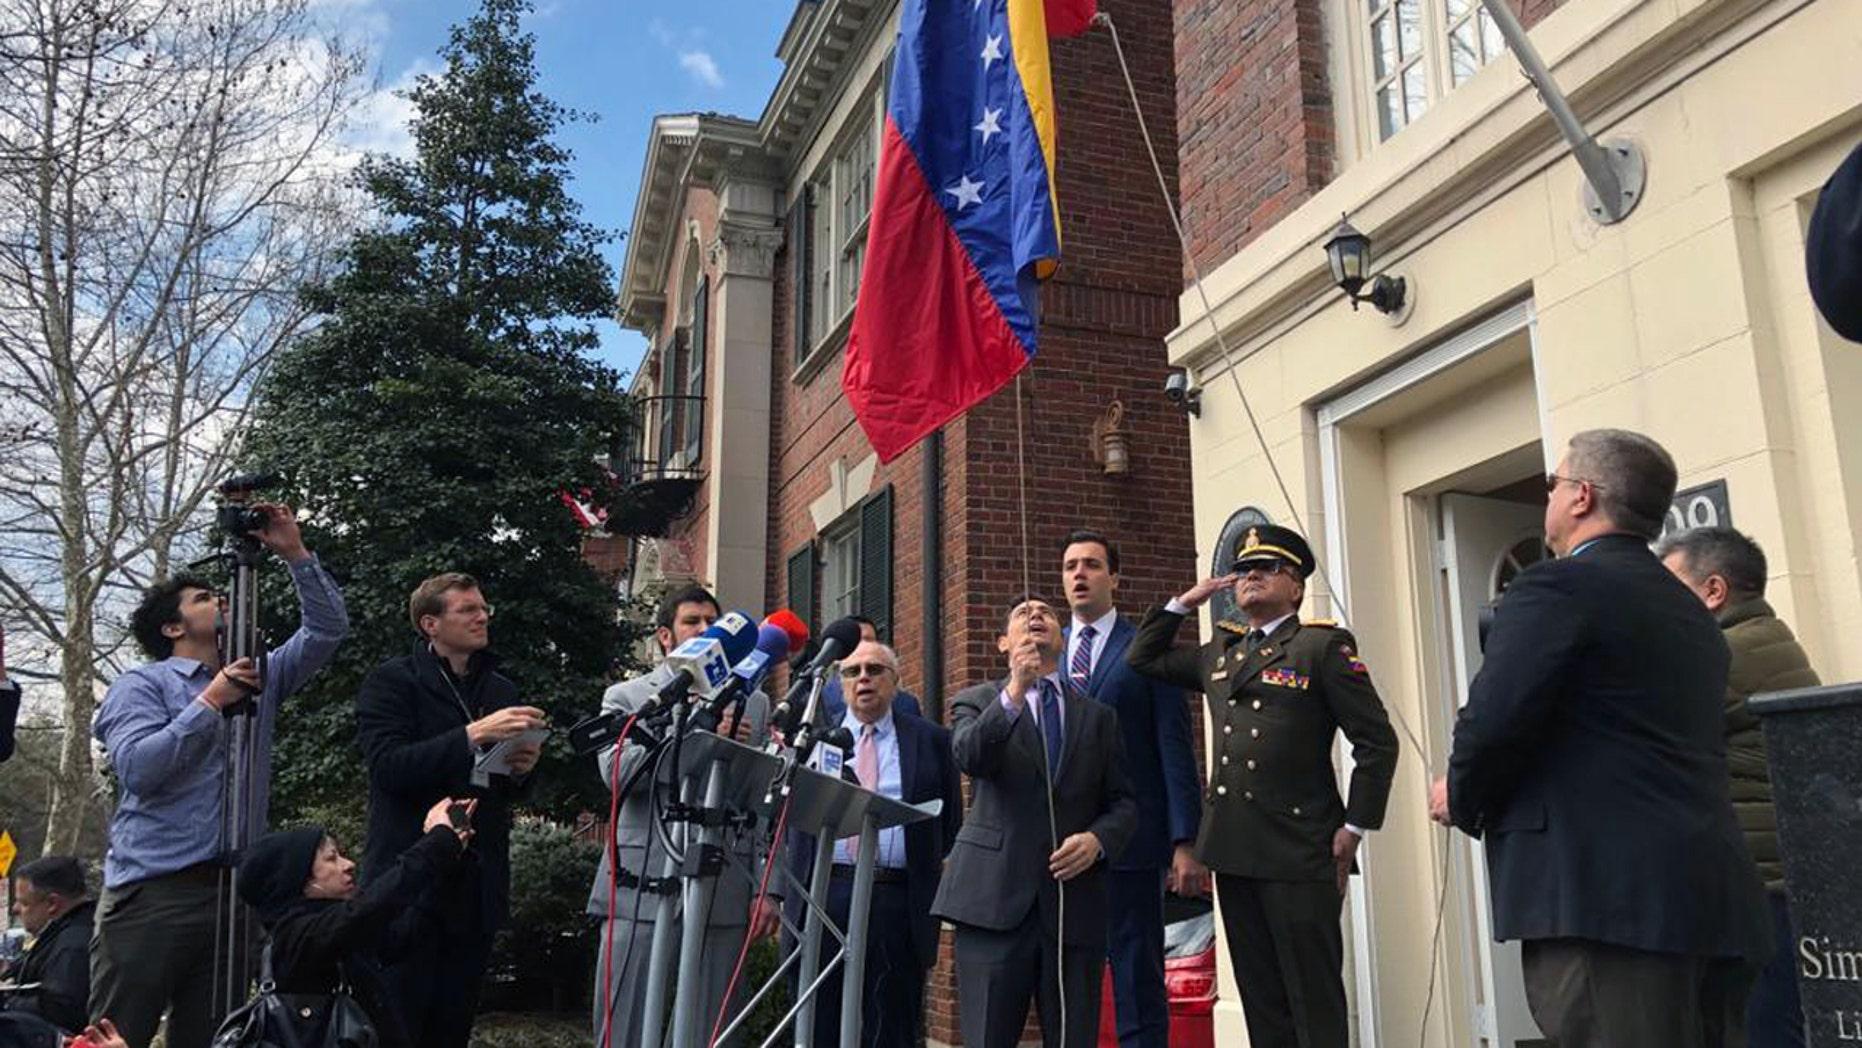 Juan Guaido's United States Ambassador Carlos Vecchio hoists a Venezuelan flag in front of a building of the Venezuelan Ministry of Defense in Washington, DC.